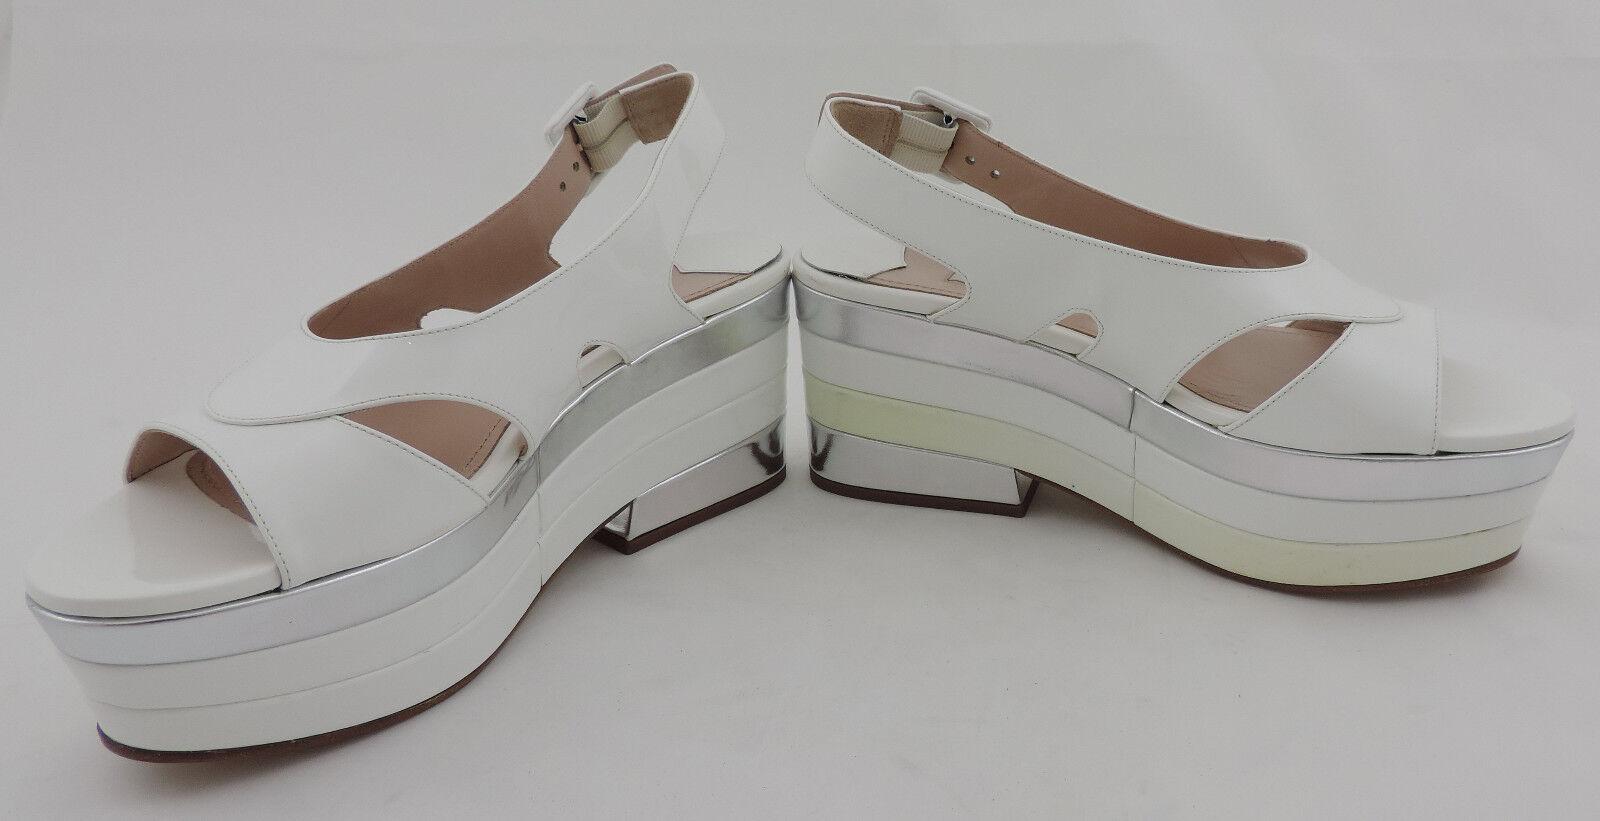 MIU MIU by VERNICE Prada sandali 36 PLATEAU BIANCO VERNICE by Larne sandals High heeels NUOVO 9abfd4